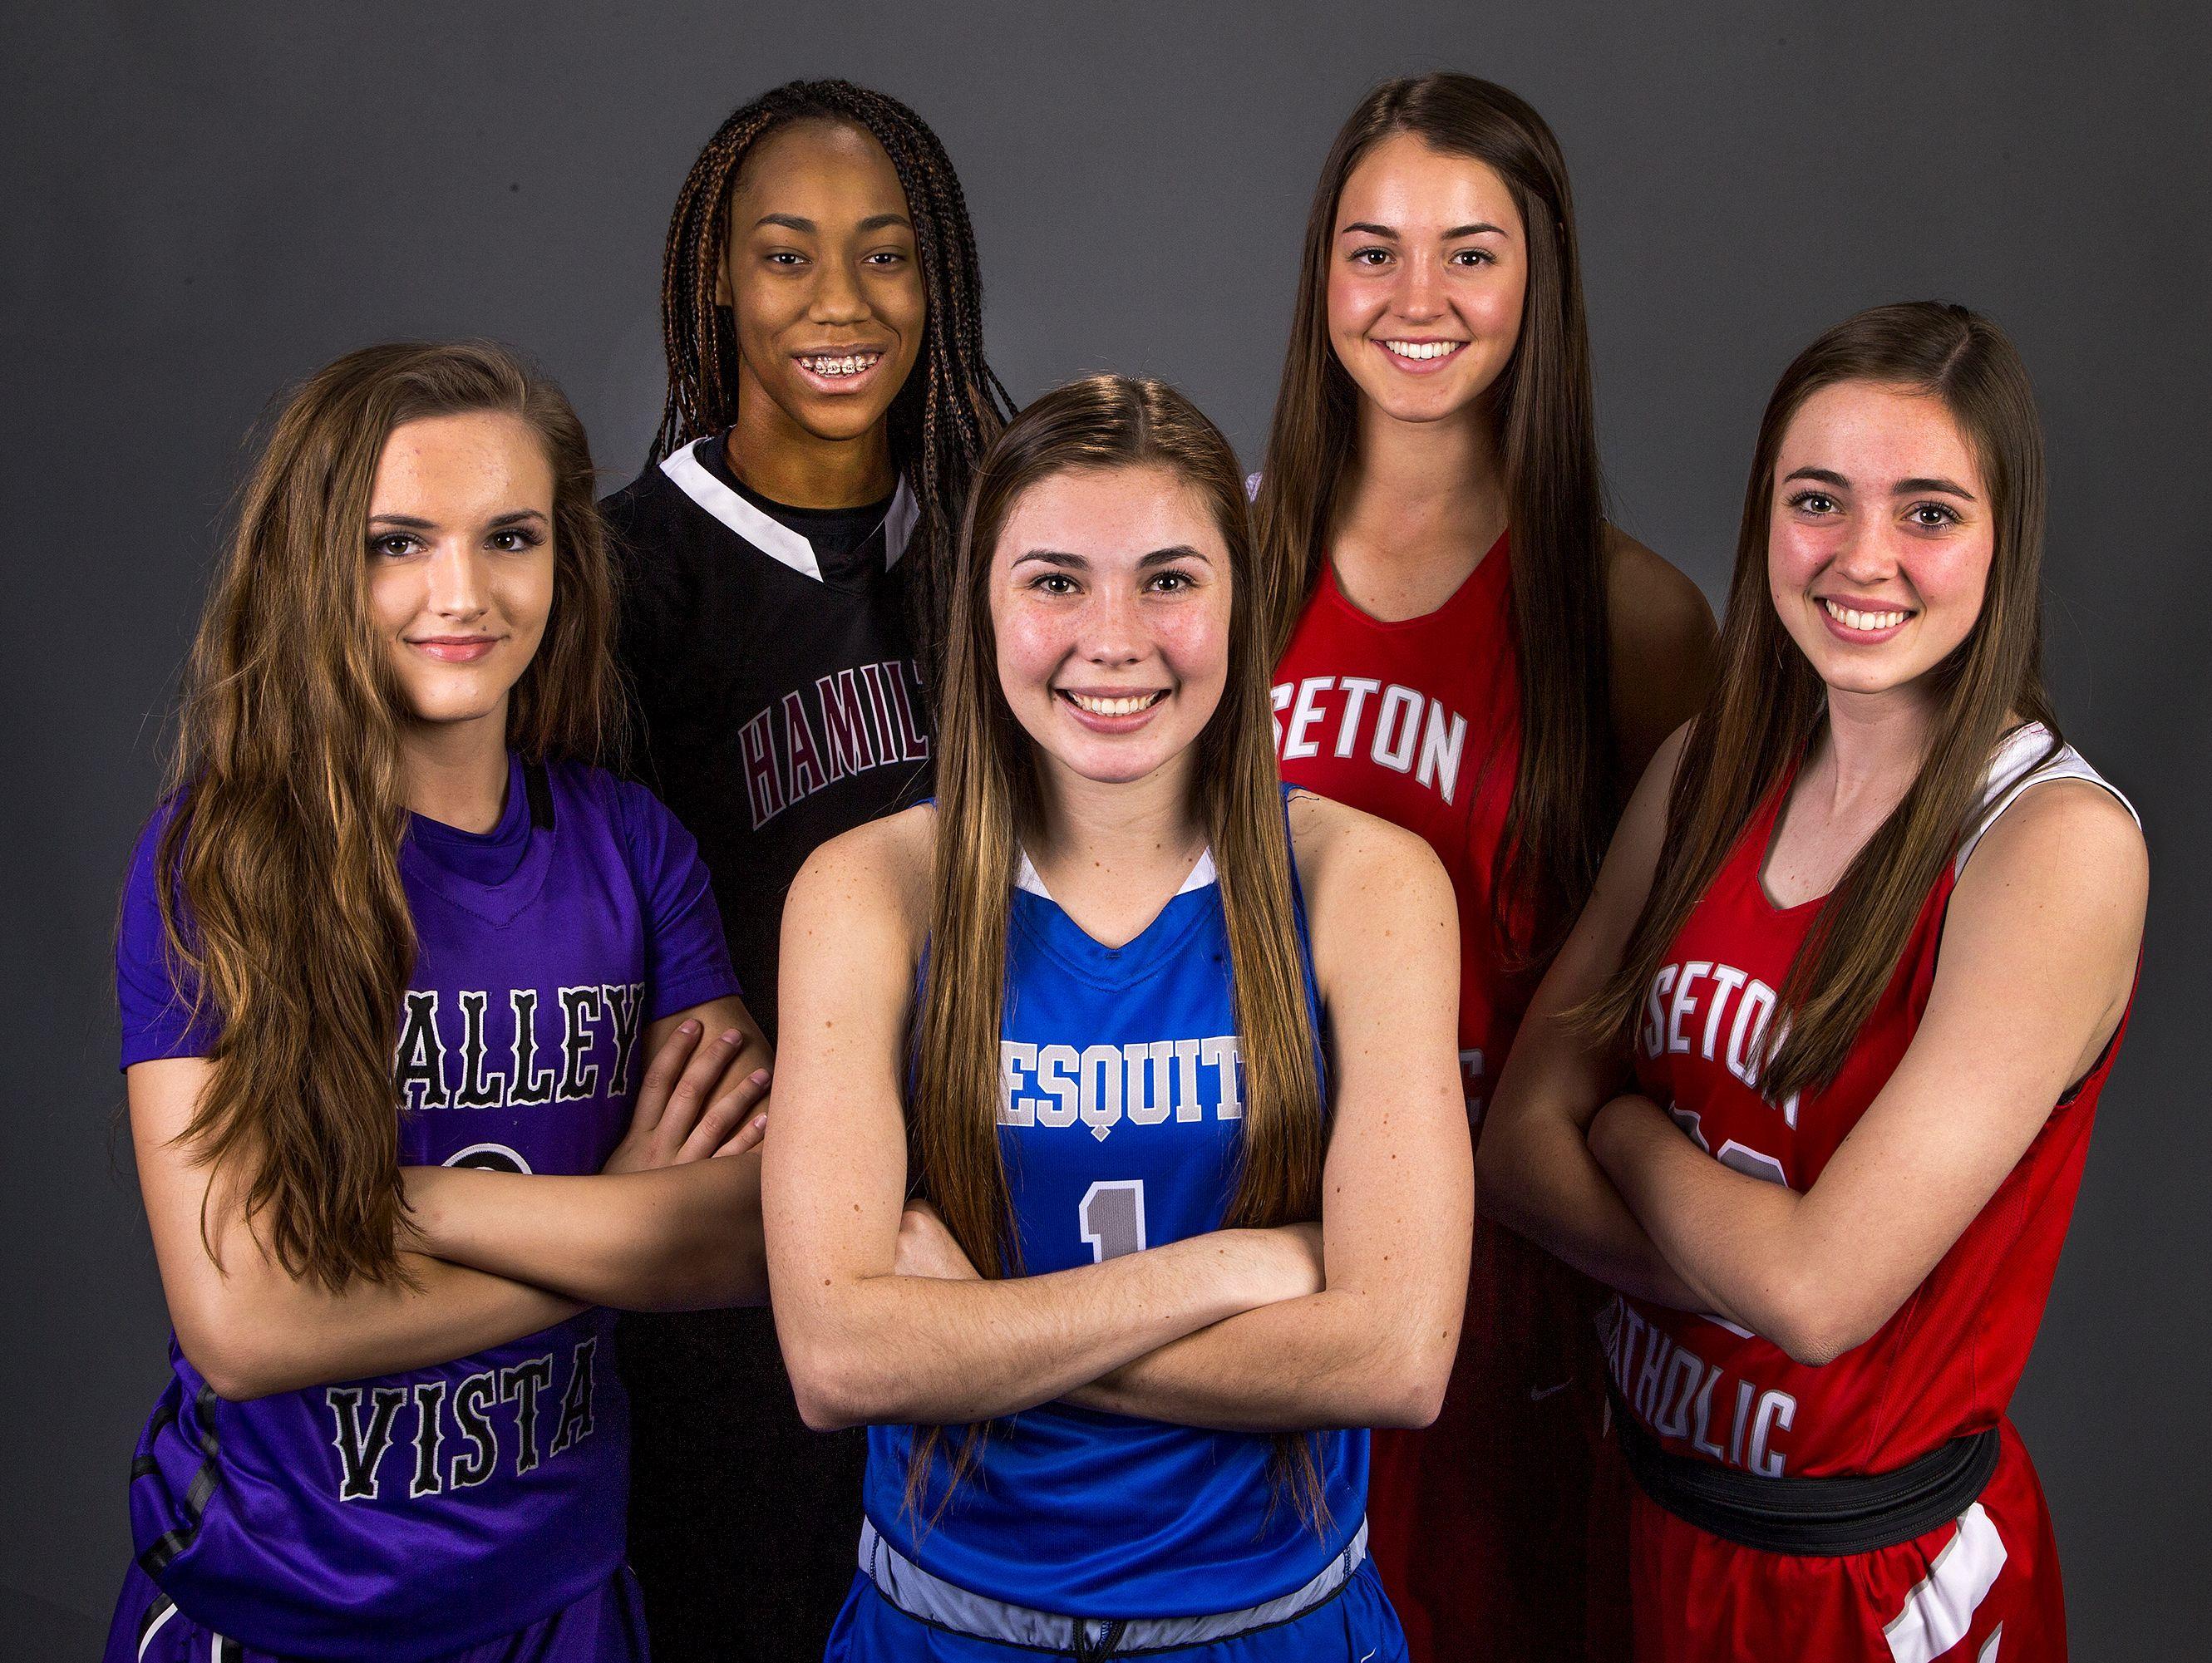 The 2016-17 All-Arizona Girls Basketball Team, from left to right; Taylor Chavez, Valley Vista, Maya Banks, Hamilton, Shaylee Gonzales, Mesquite, Jenn Wirth, Seton Catholic, and Sarah Barcello, Seton Catholic.